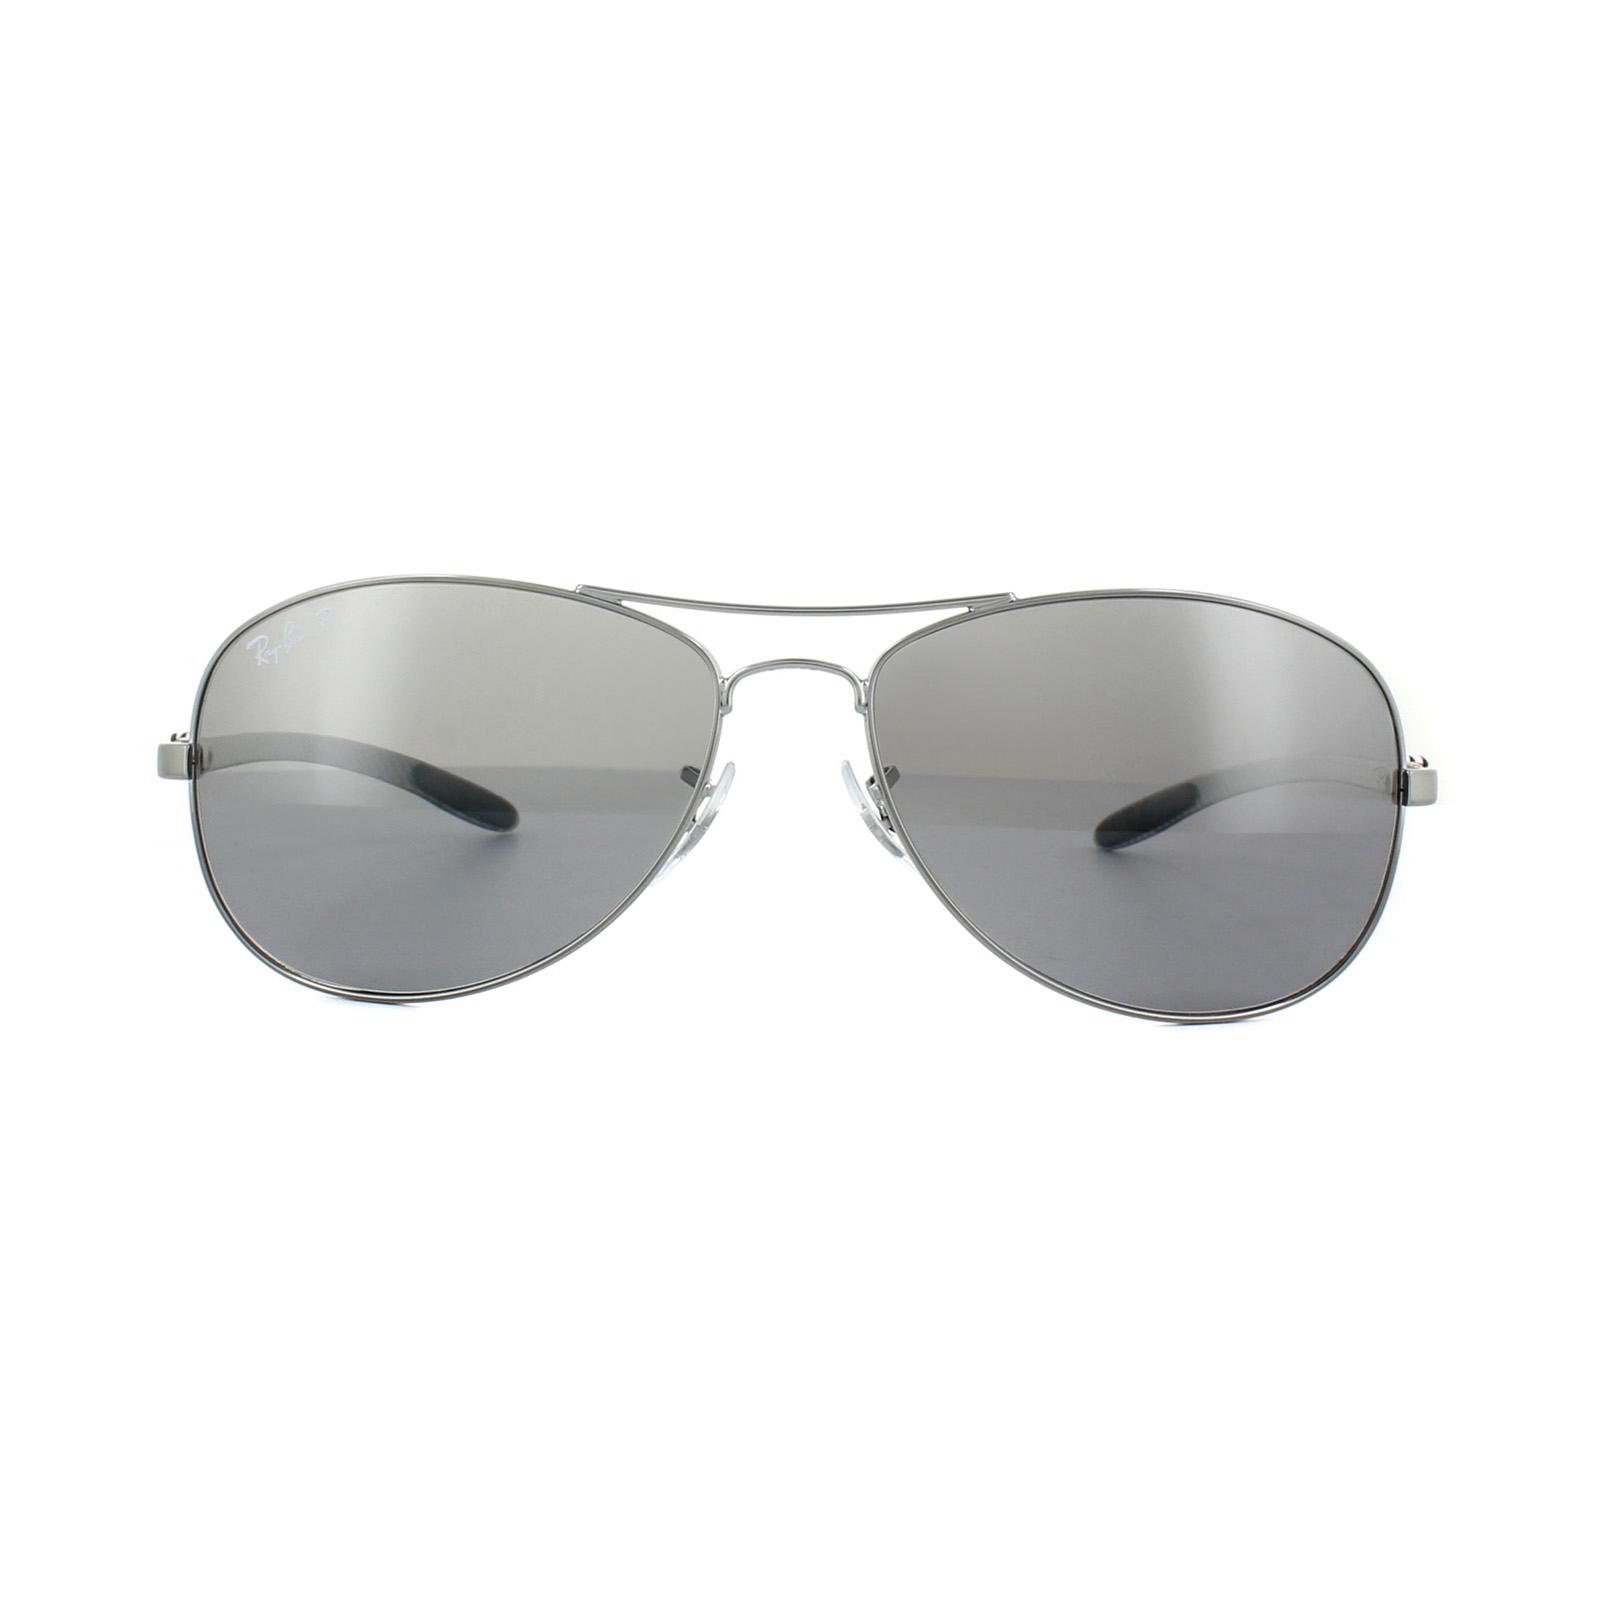 2be161387a Cheap Ray-Ban 8301 Sunglasses - Discounted Sunglasses